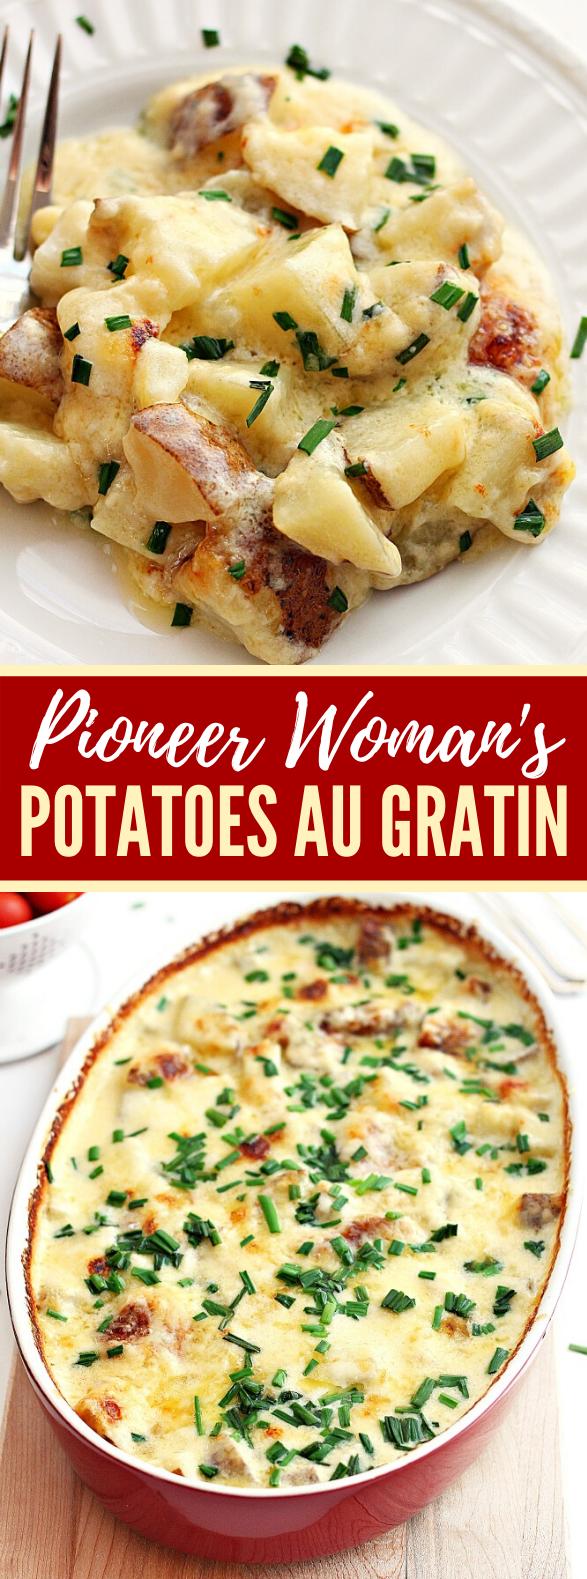 PIONEER WOMAN'S POTATOES AU GRATIN #dinner #holidaymeal